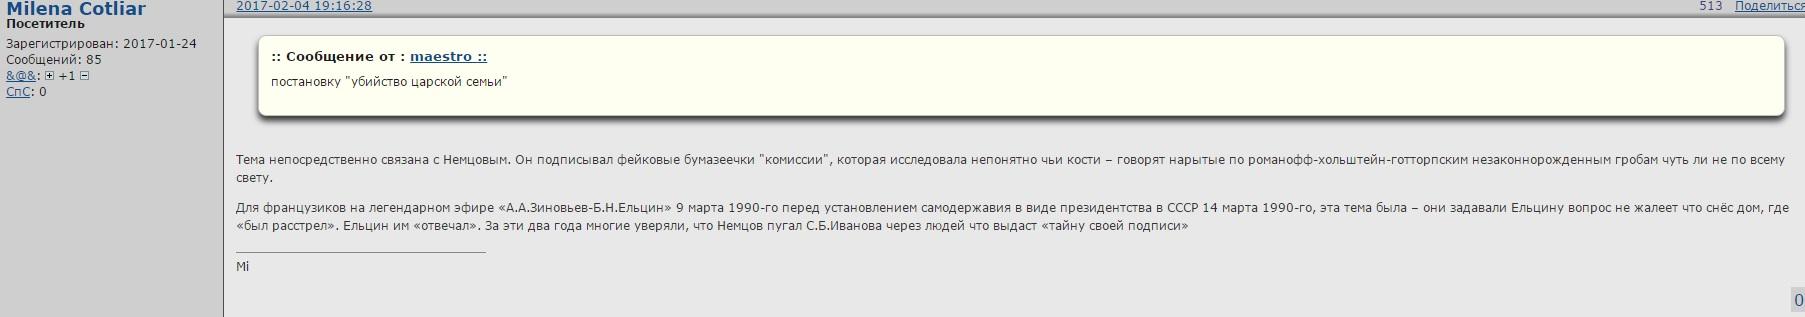 http://s8.hostingkartinok.com/uploads/images/2017/02/eaac85c5d9ebc801de355bc459481226.jpg